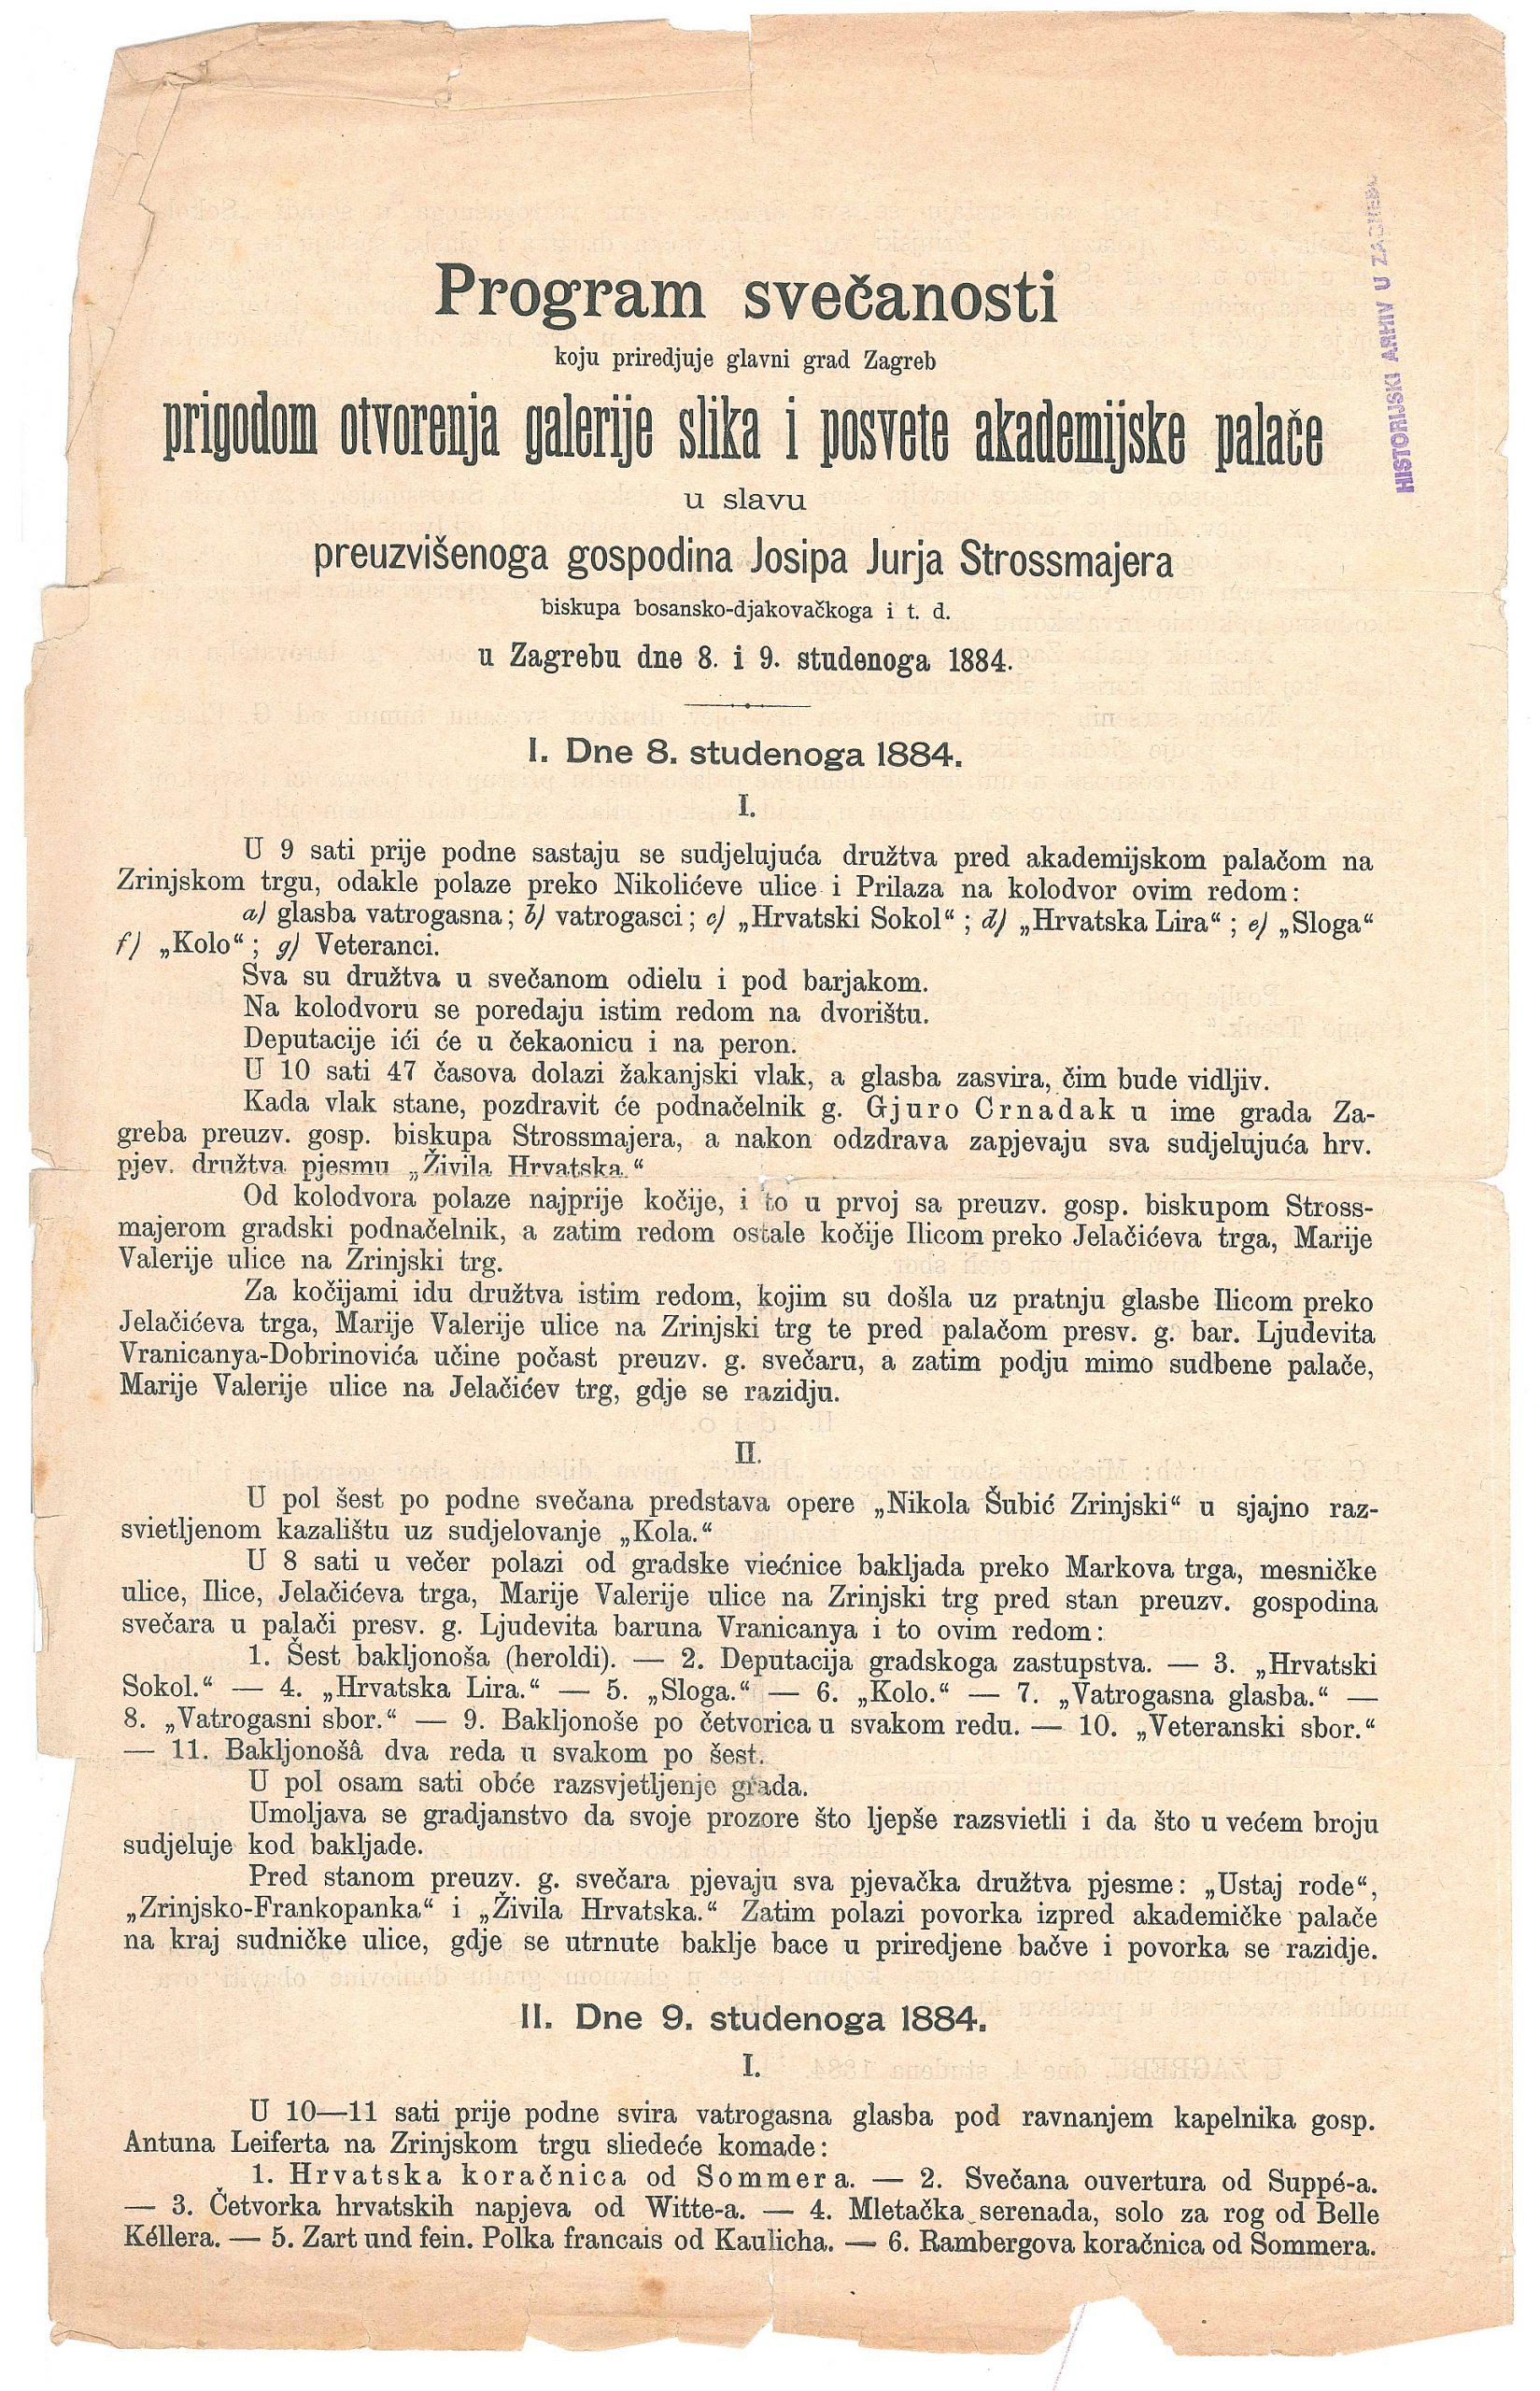 Proglas Odbora s programom svečanosti, 4. studenoga 1884. (vlasništvo/imatelj: Državni arhiv u Zagrebu)